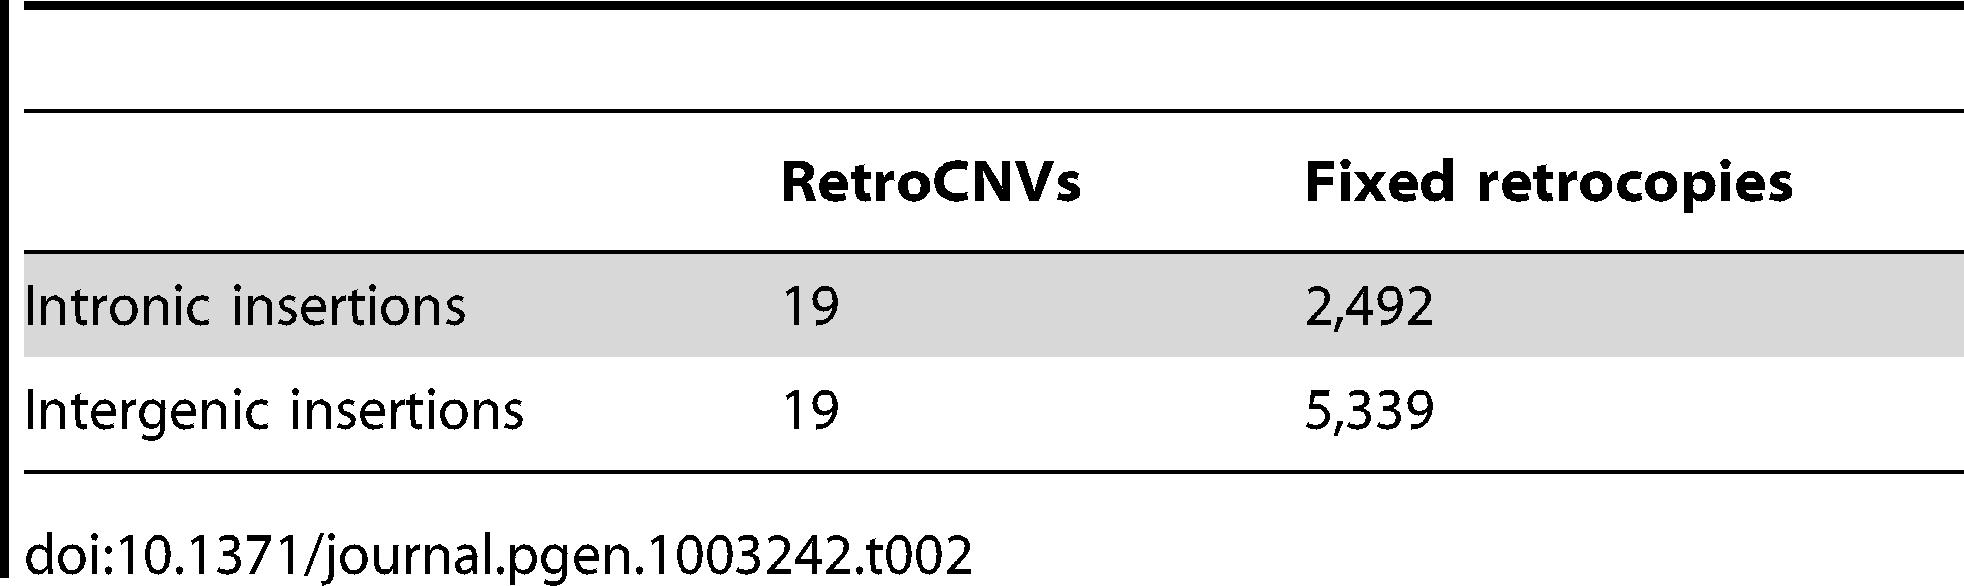 RetroCNVs versus fixed retrocopies inserted in intronic versus intergenic sequence.